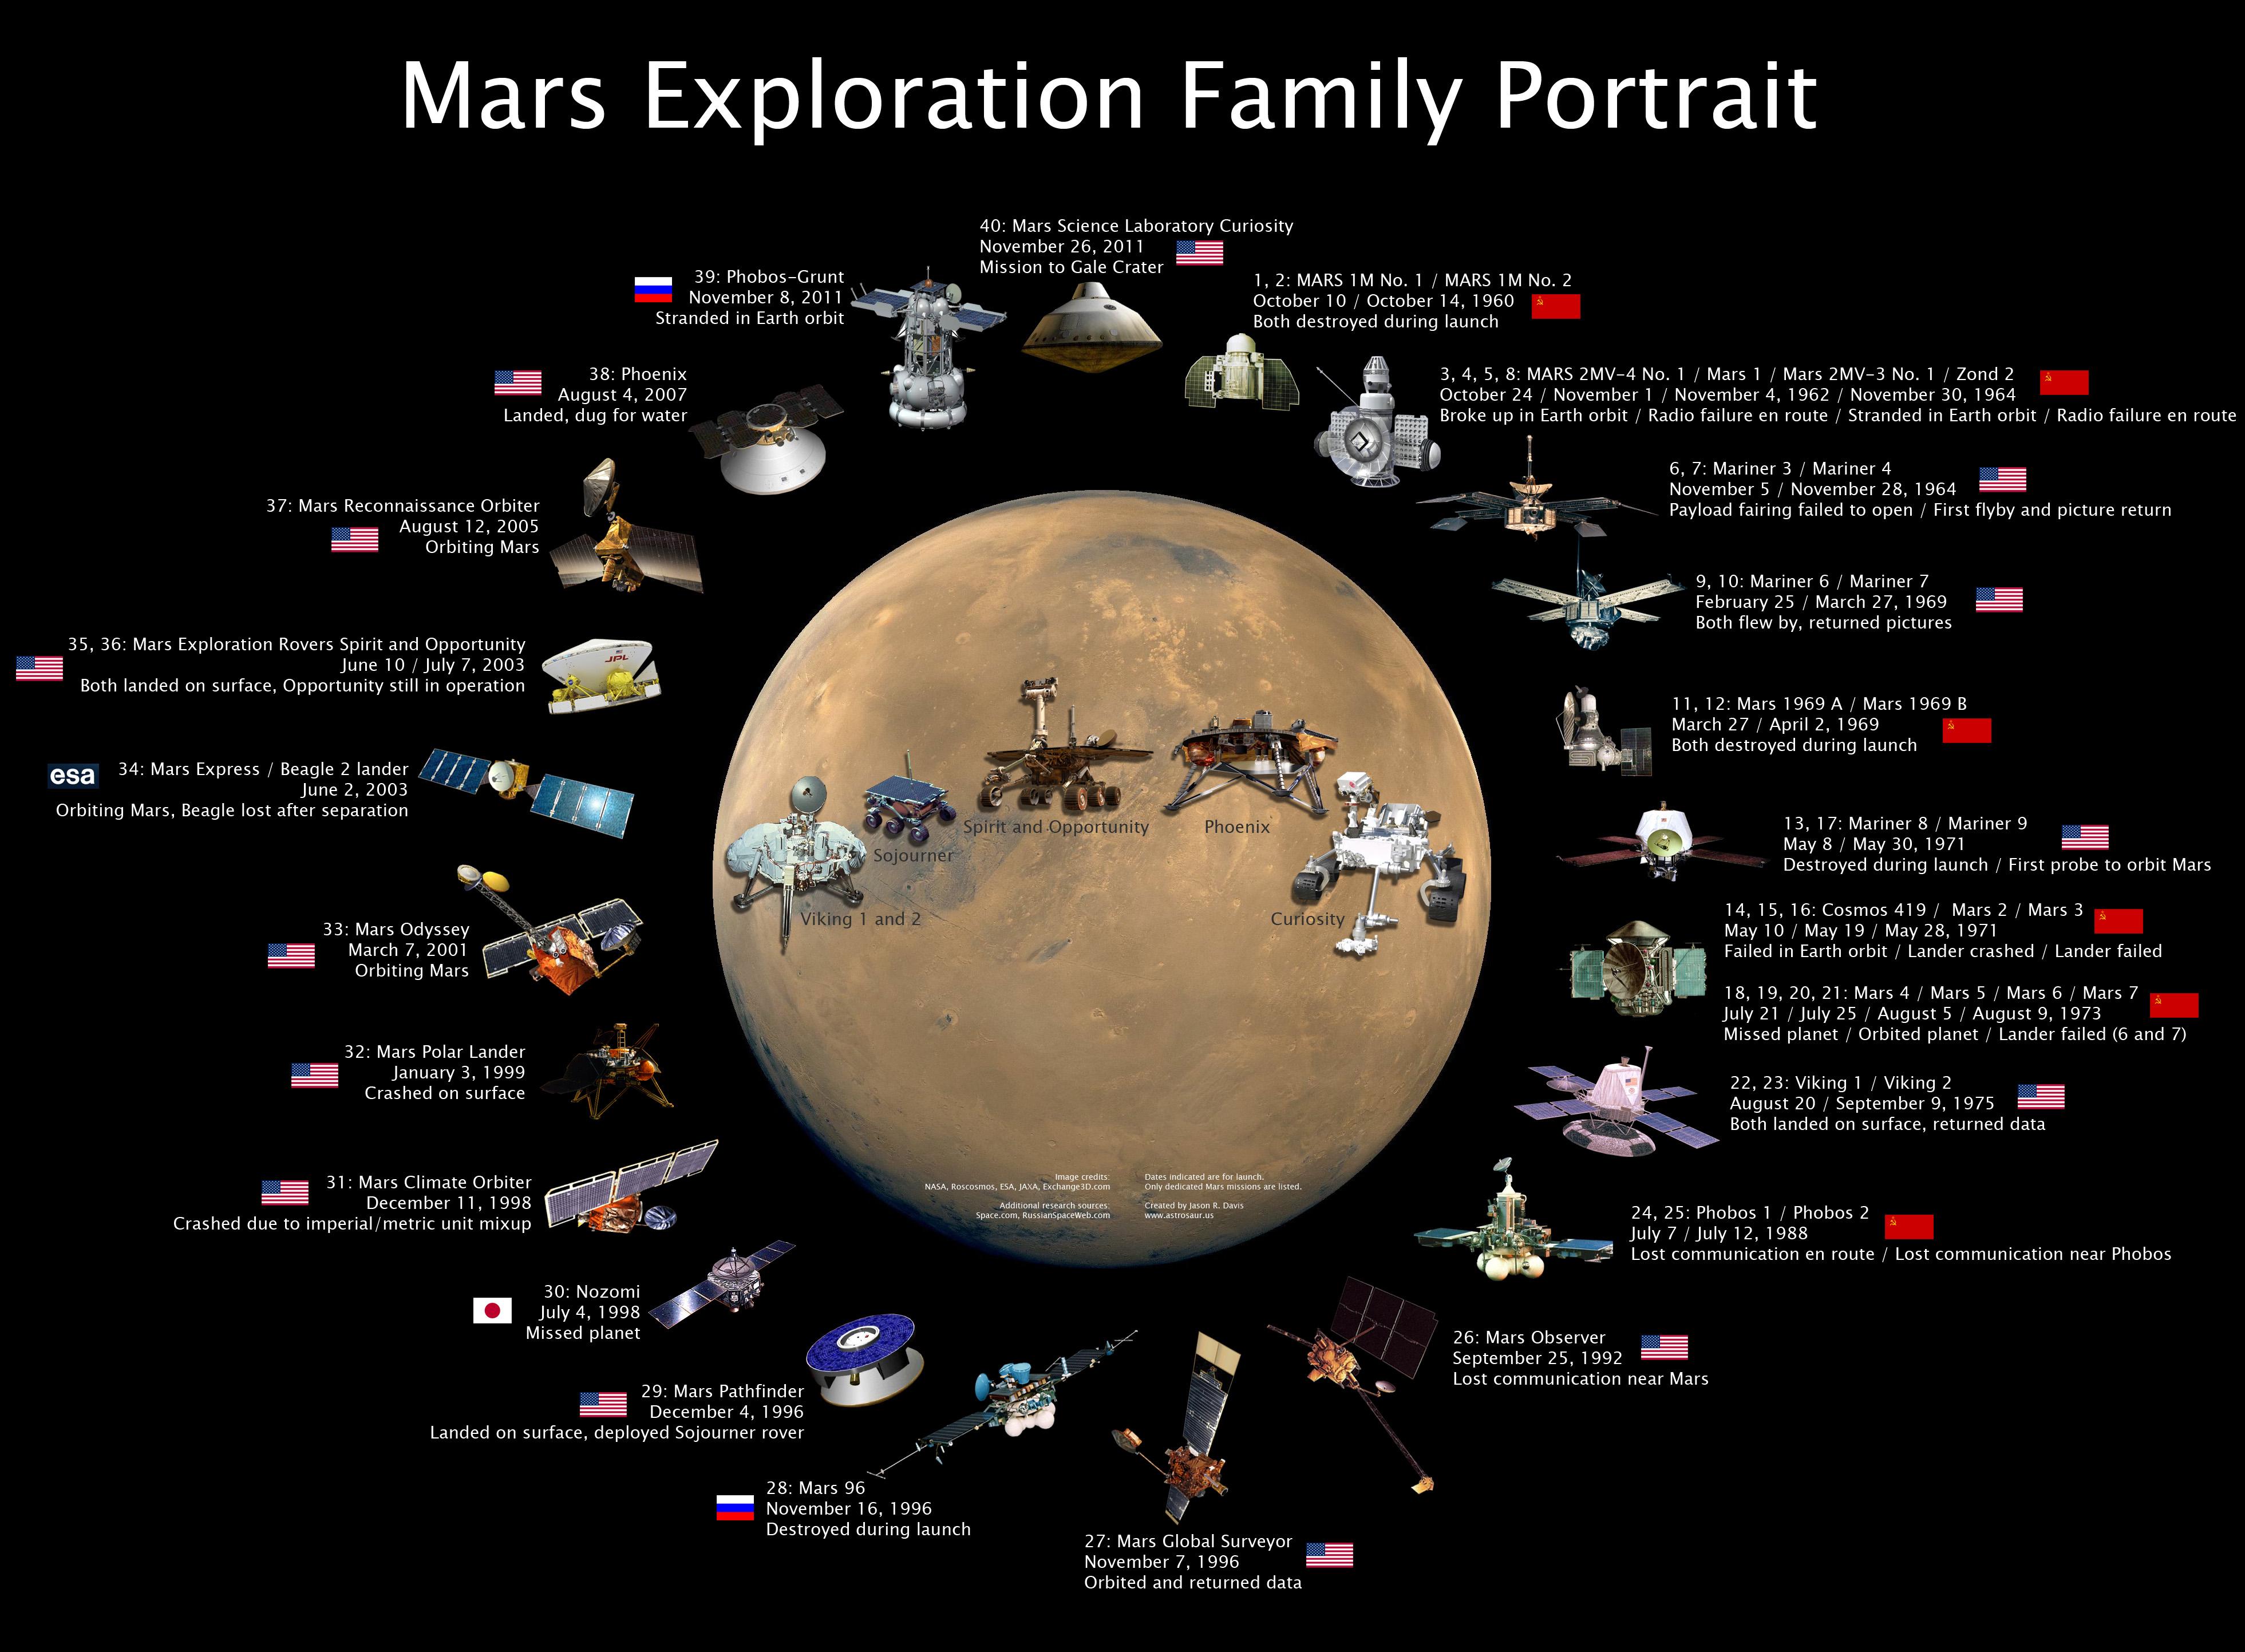 http://planetary.s3.amazonaws.com/image/mars-exploration-family-portrait.jpg